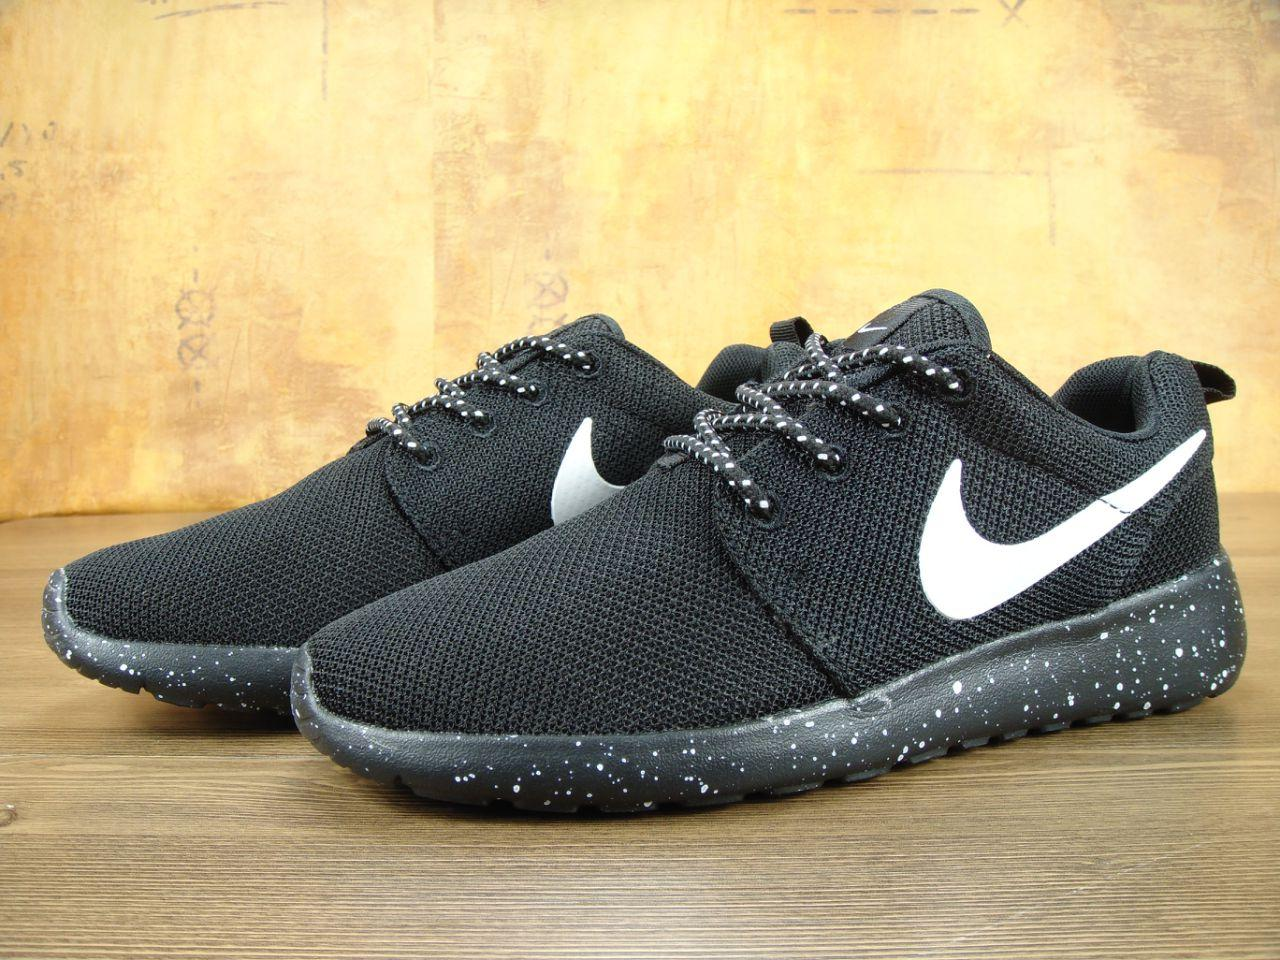 2c7efc10 Женские Кроссовки Nike Roshe Run, Найк рош ран (реплика) - Интернет Магазин